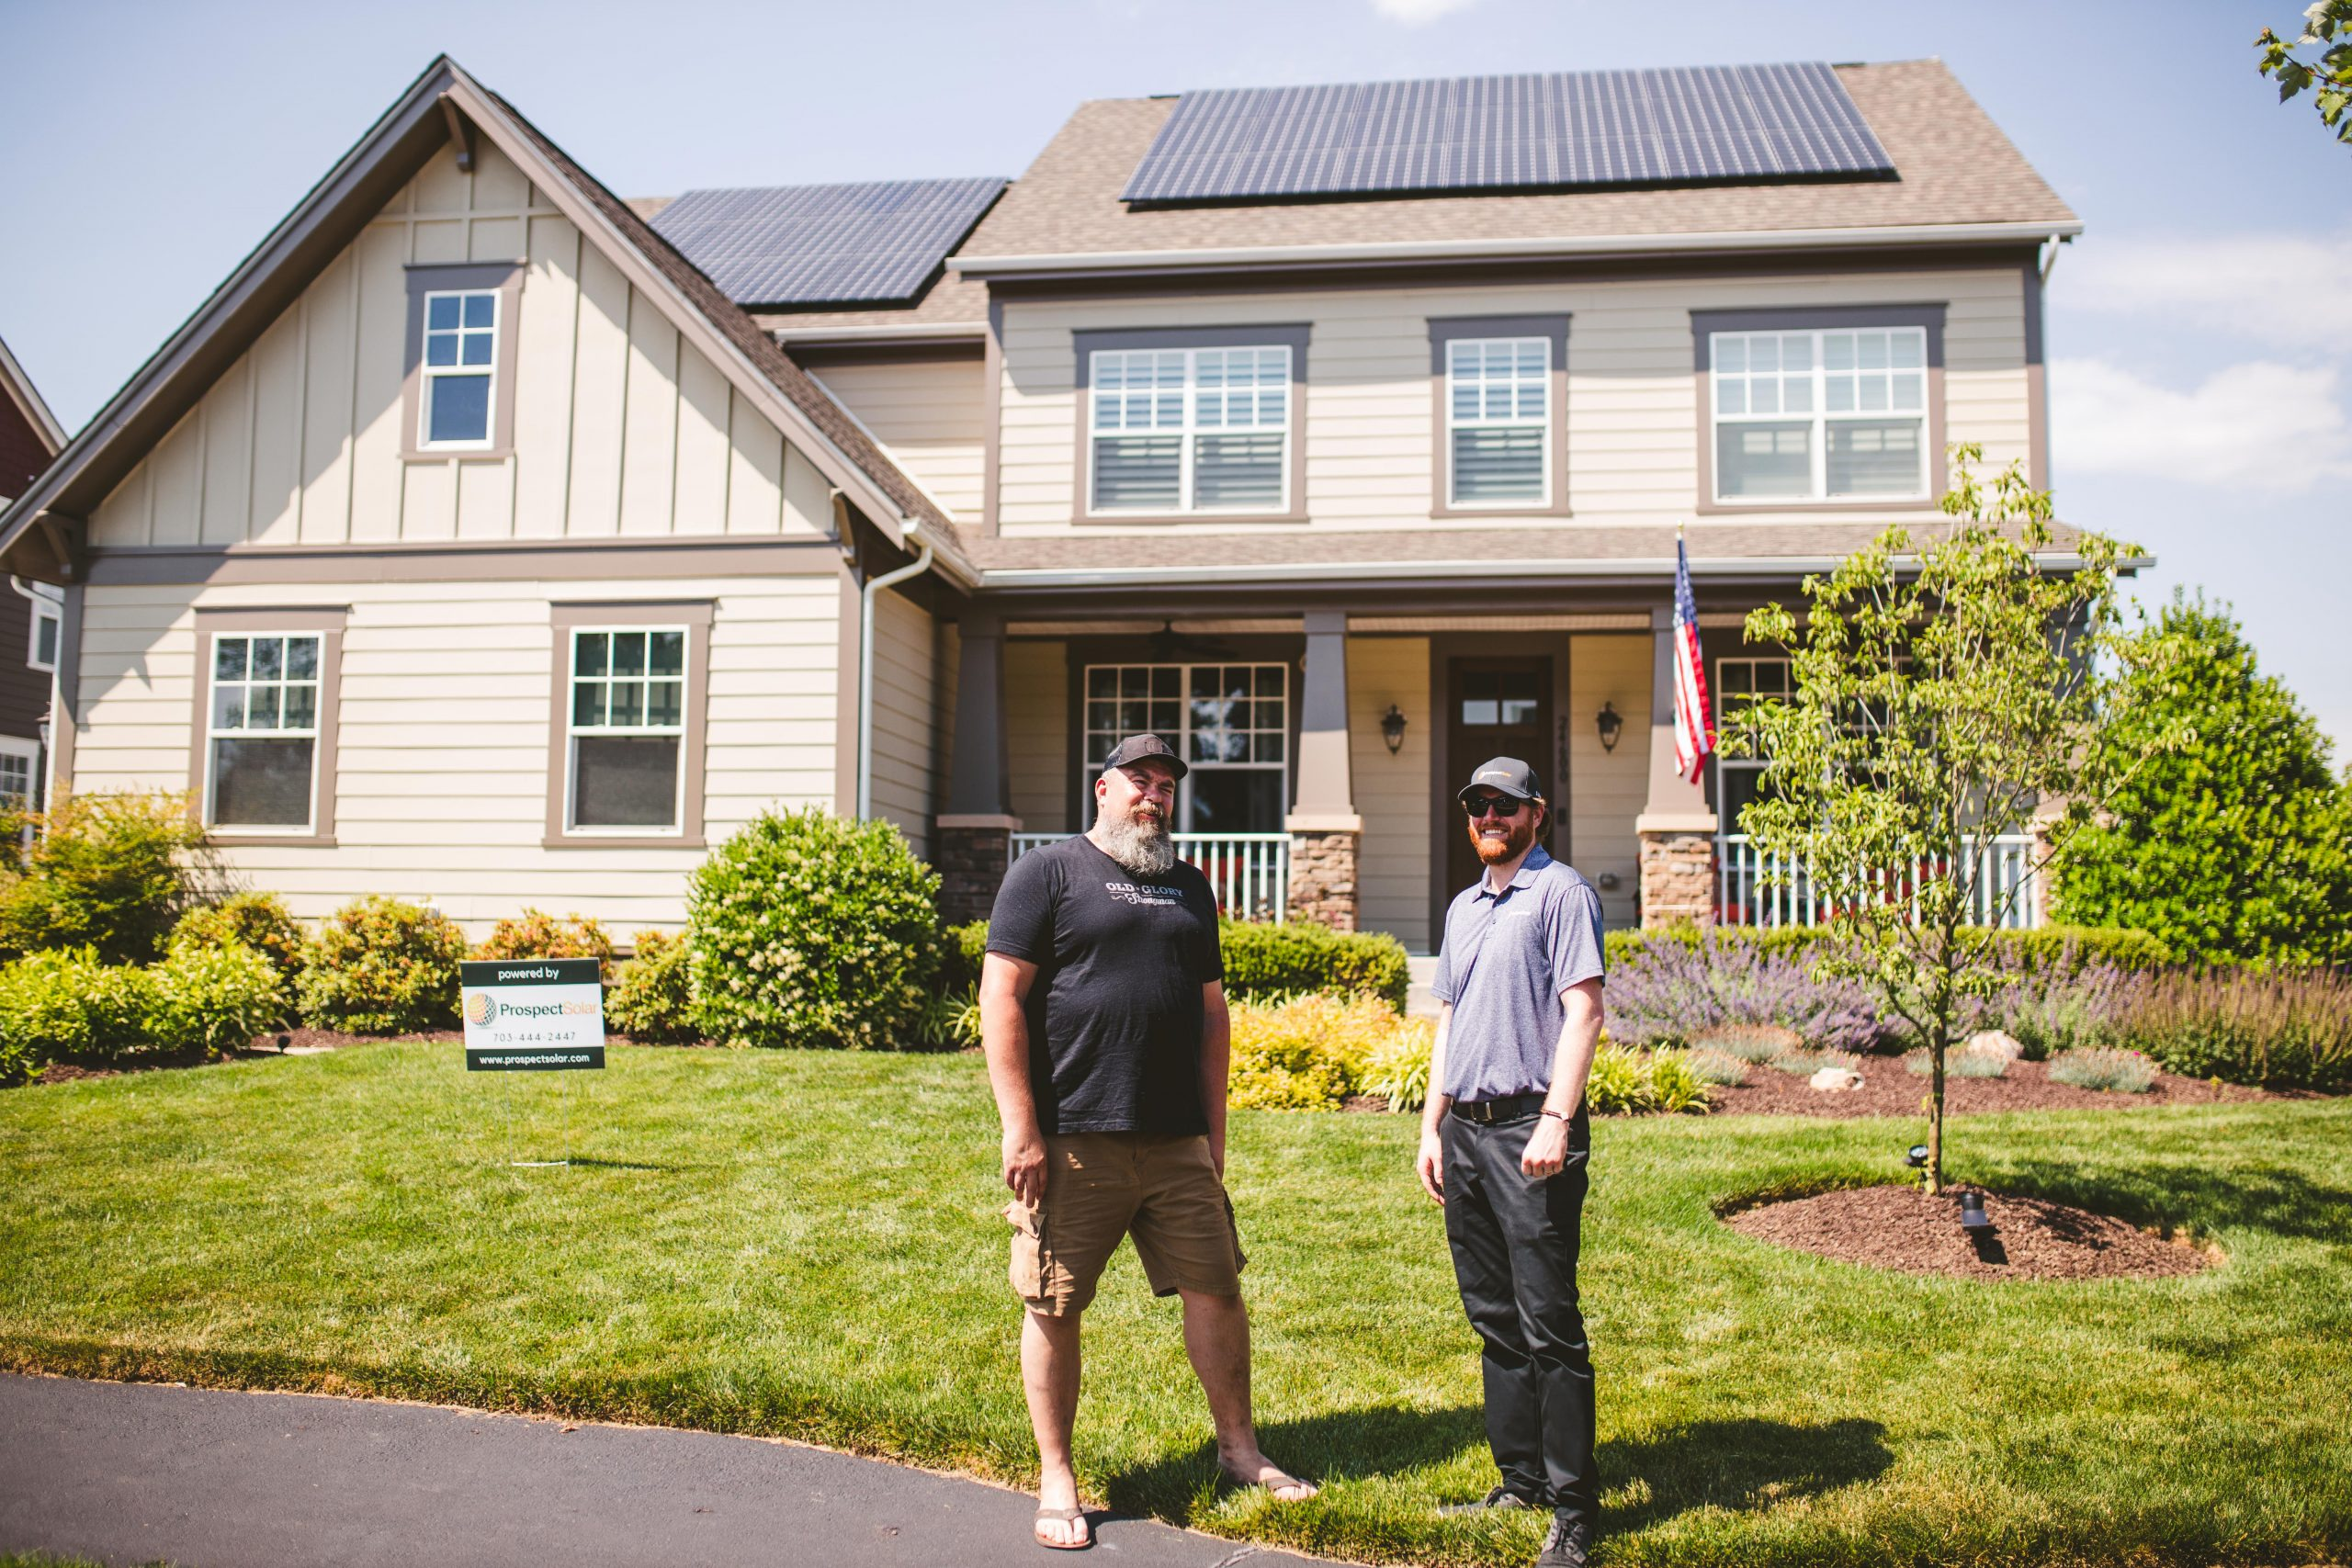 Image of Prospect Solar home installation